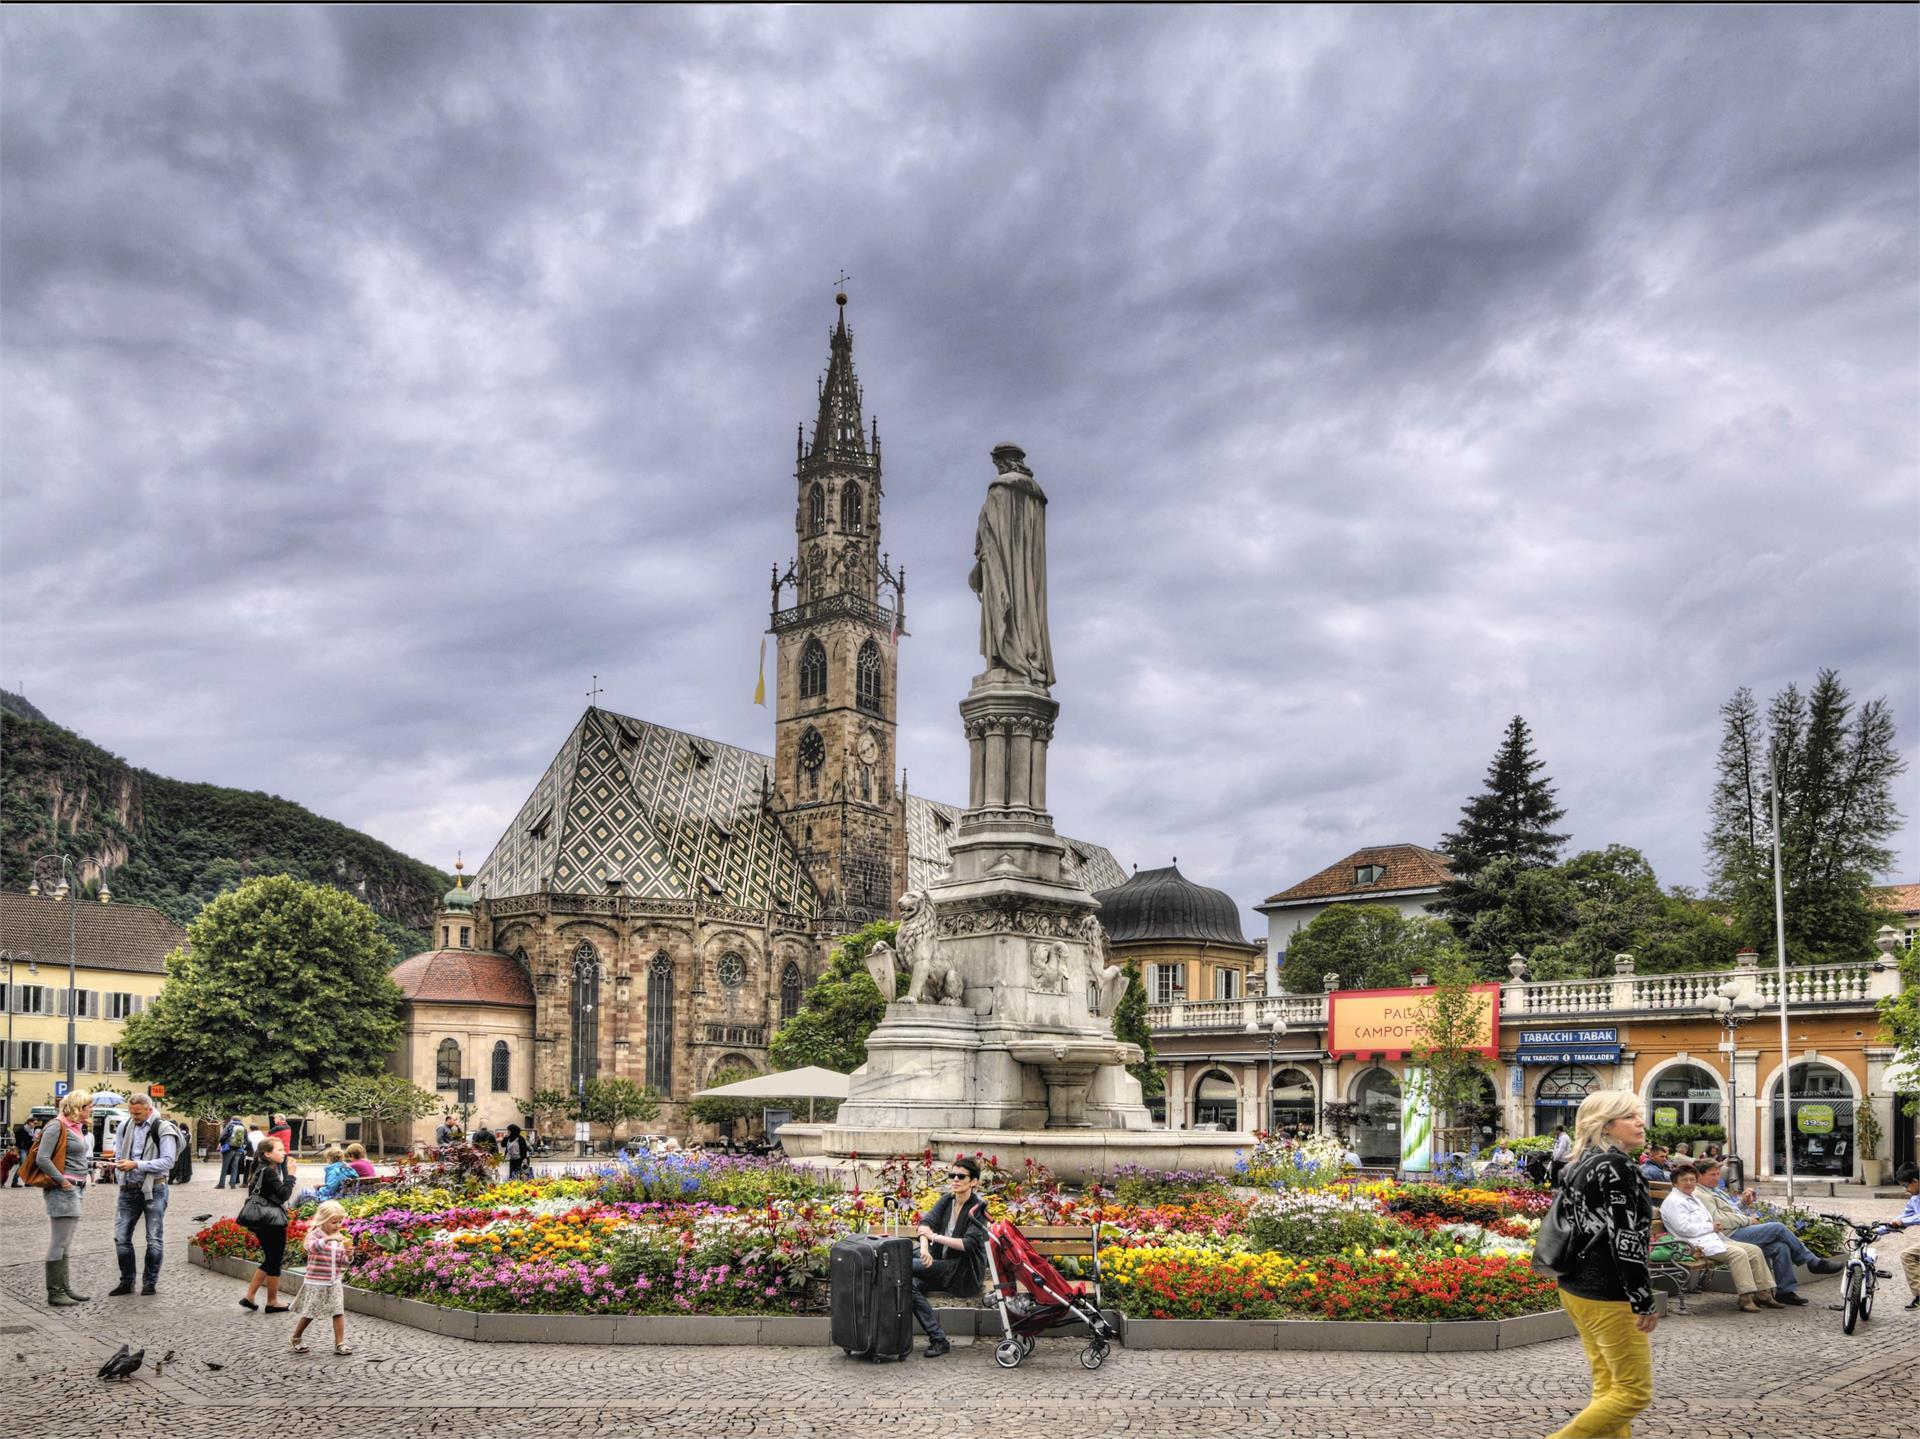 Duomo dedicato a Maria Assunta • Chiesa » outdooractive.com